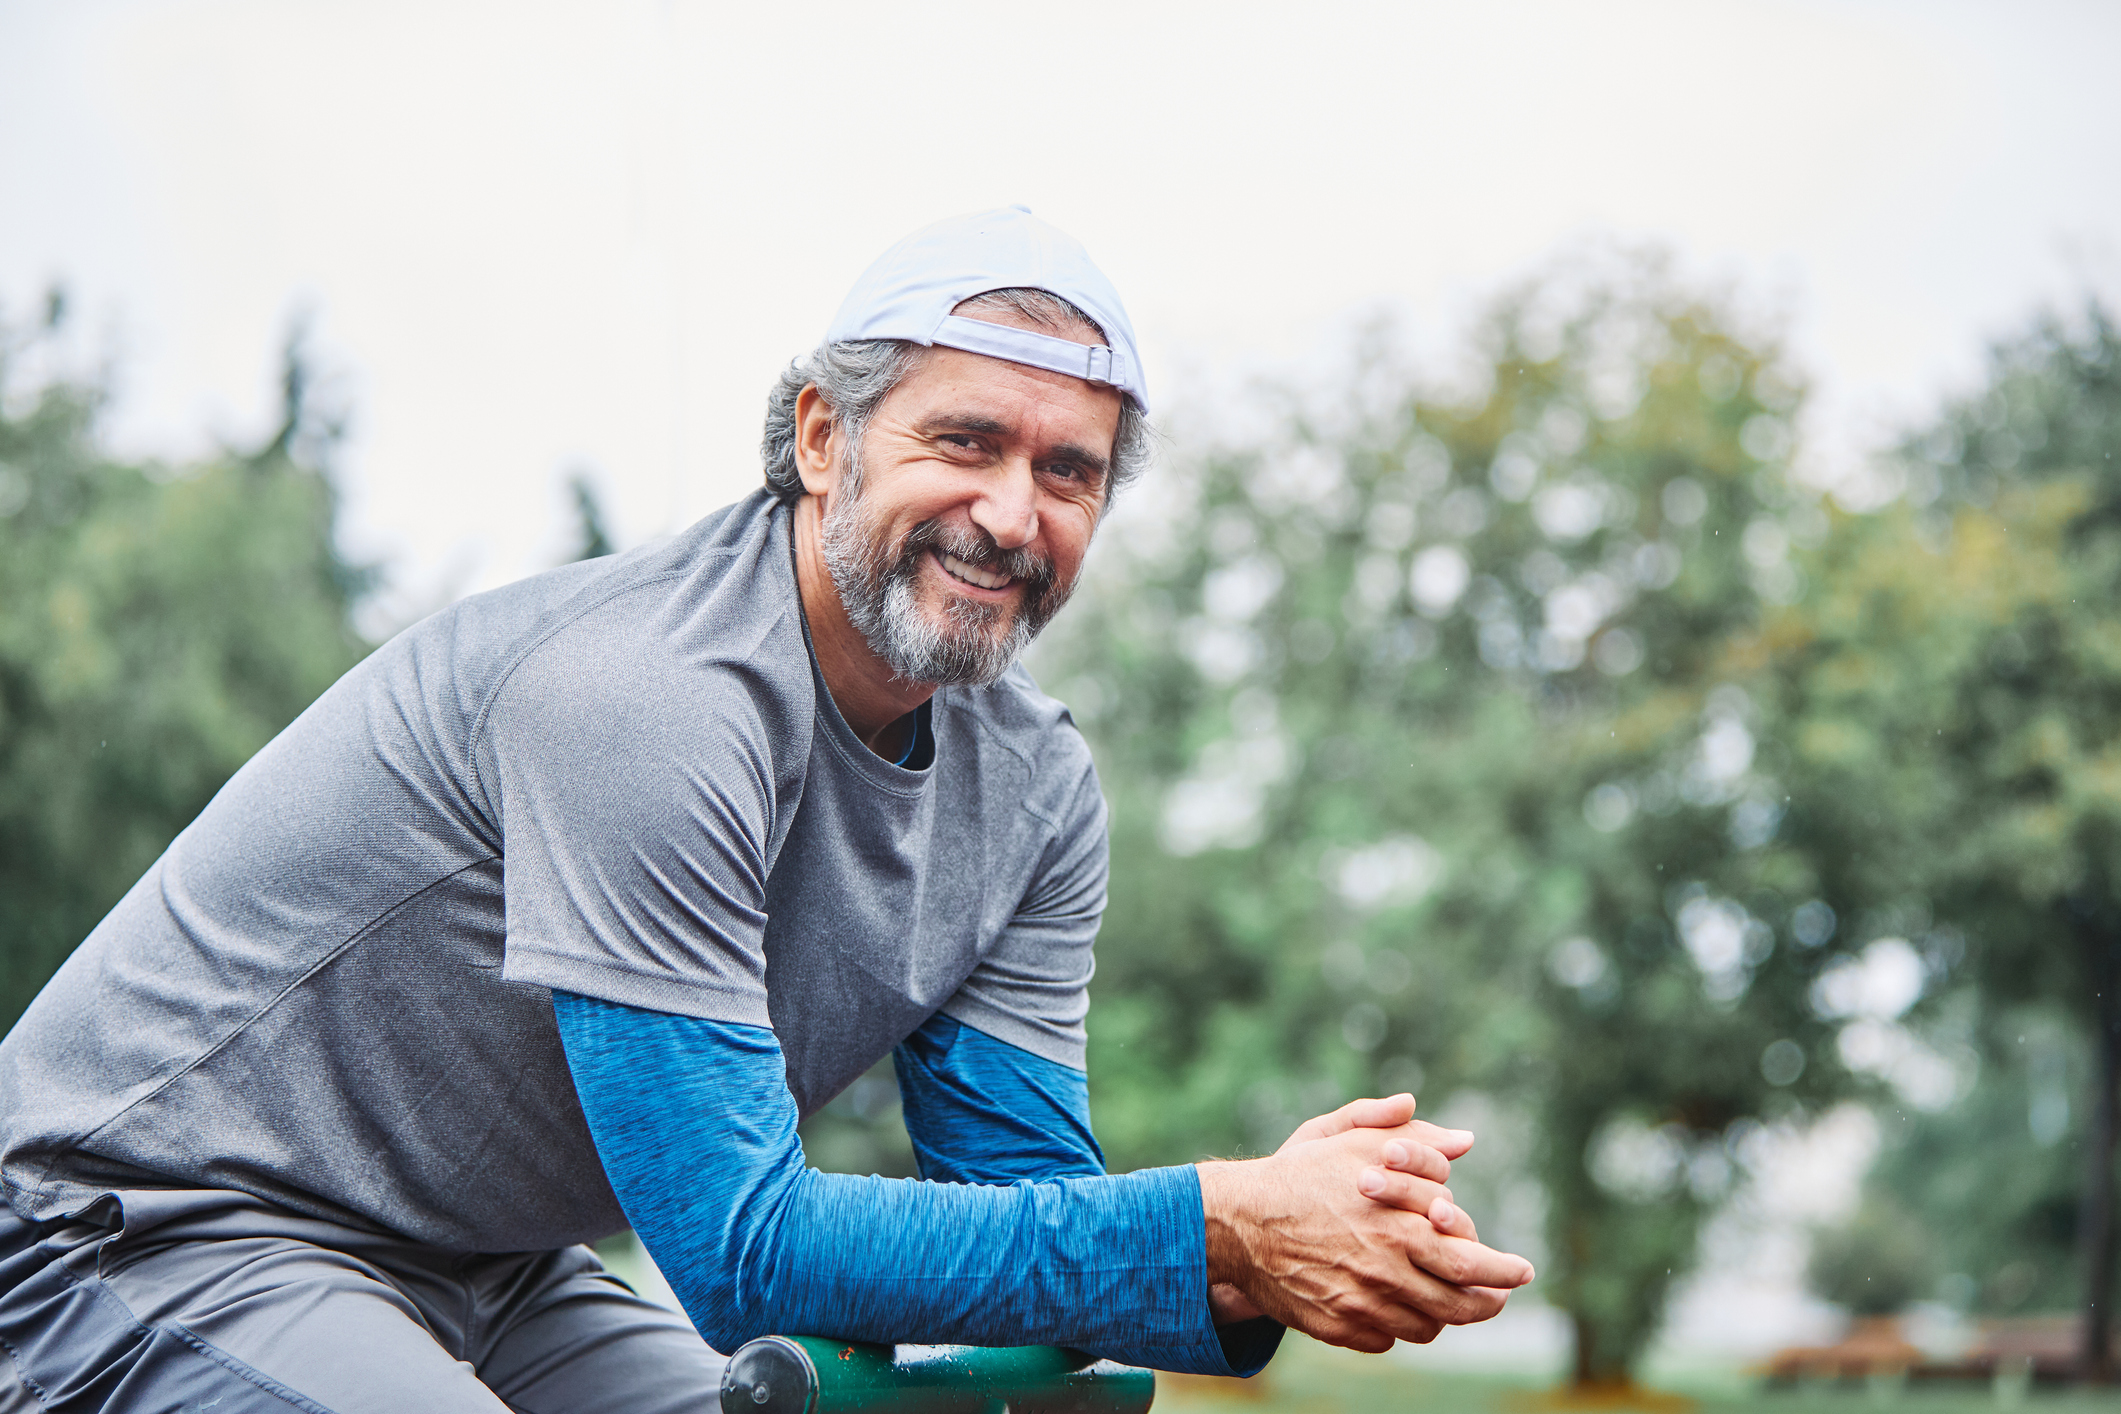 Dimethylglycine: The key to stamina, performance and endurance